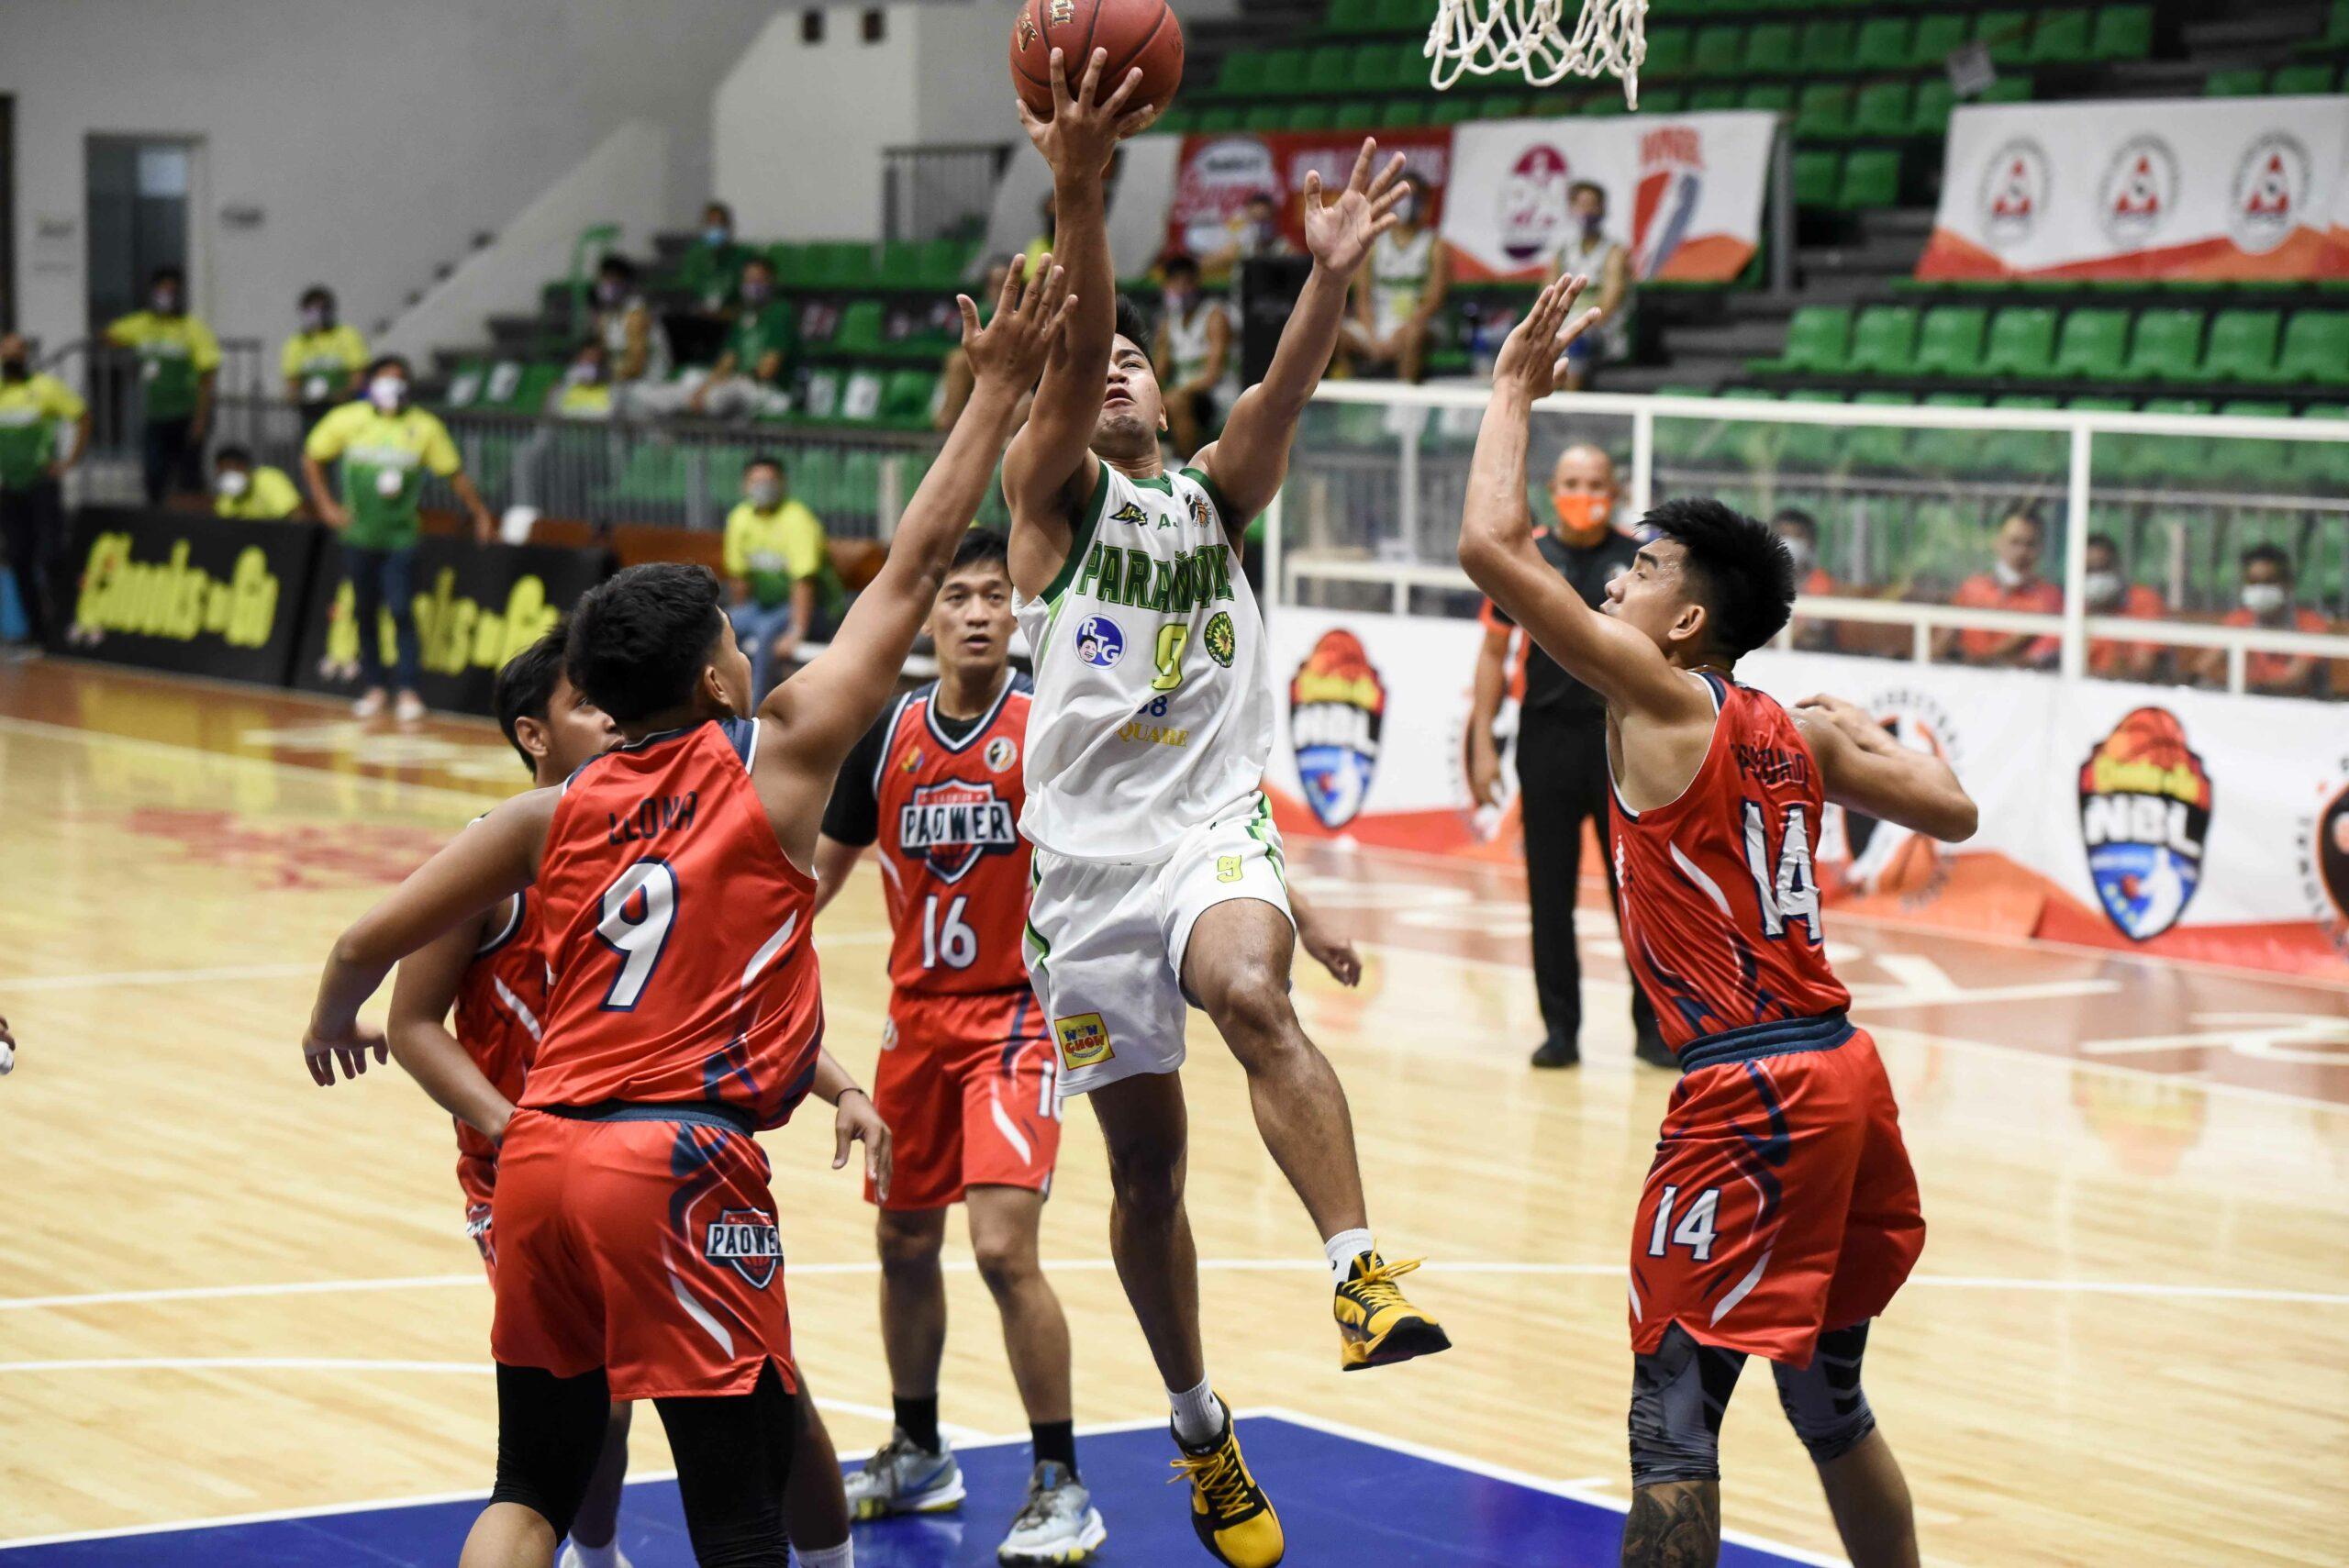 2021-Chooks-NBL-Paranaque-vs-La-Union-Angelo-Razon-scaled Apolonio, Agulan link up as La Union edges Paranaque for share of NBL lead Basketball NBL News  - philippine sports news